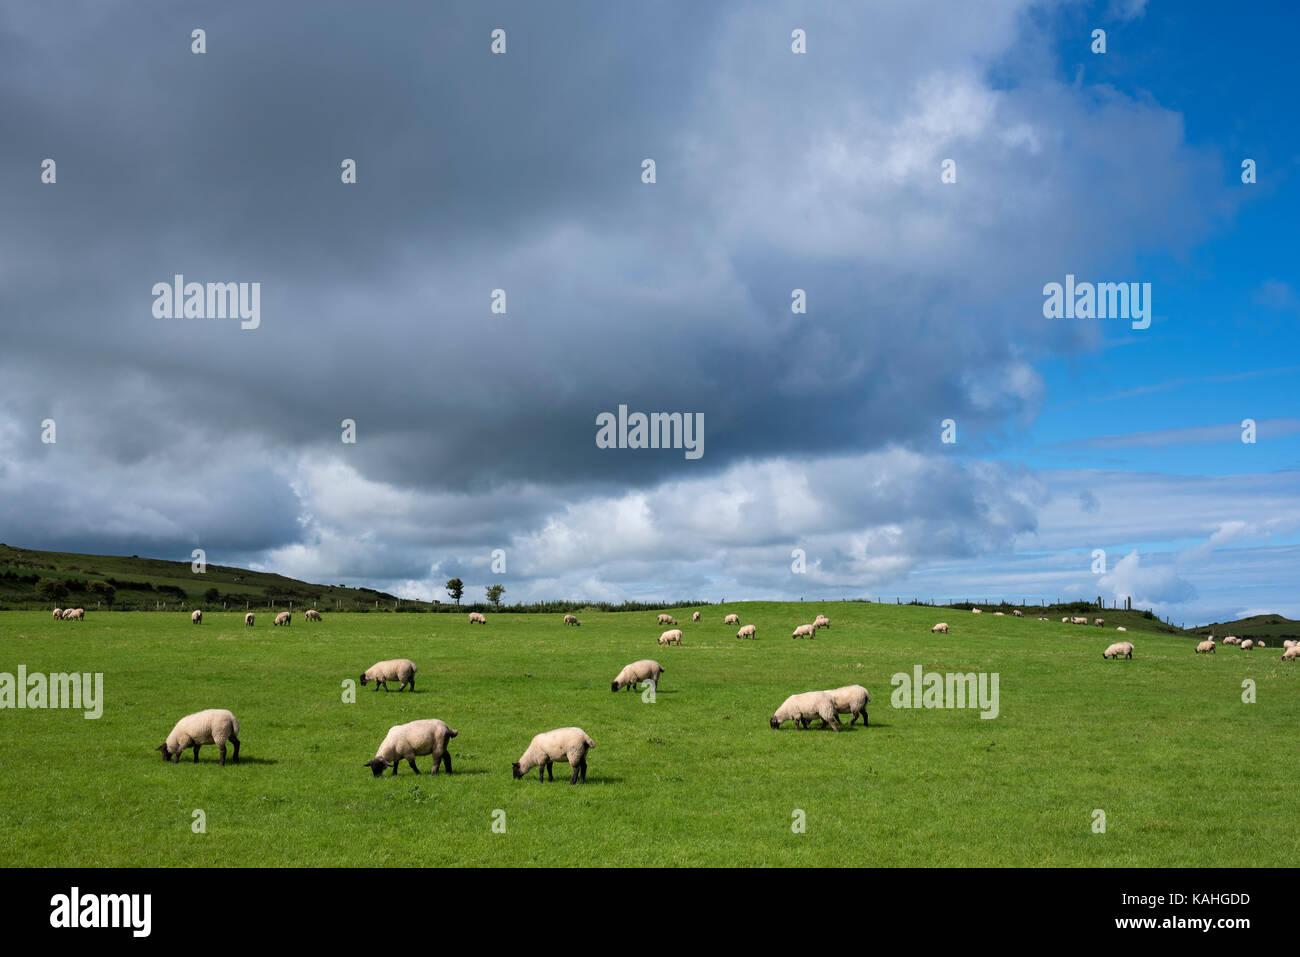 Sheep pasture near Ballycastle, County Antrim, Northern Ireland, Great Britain - Stock Image